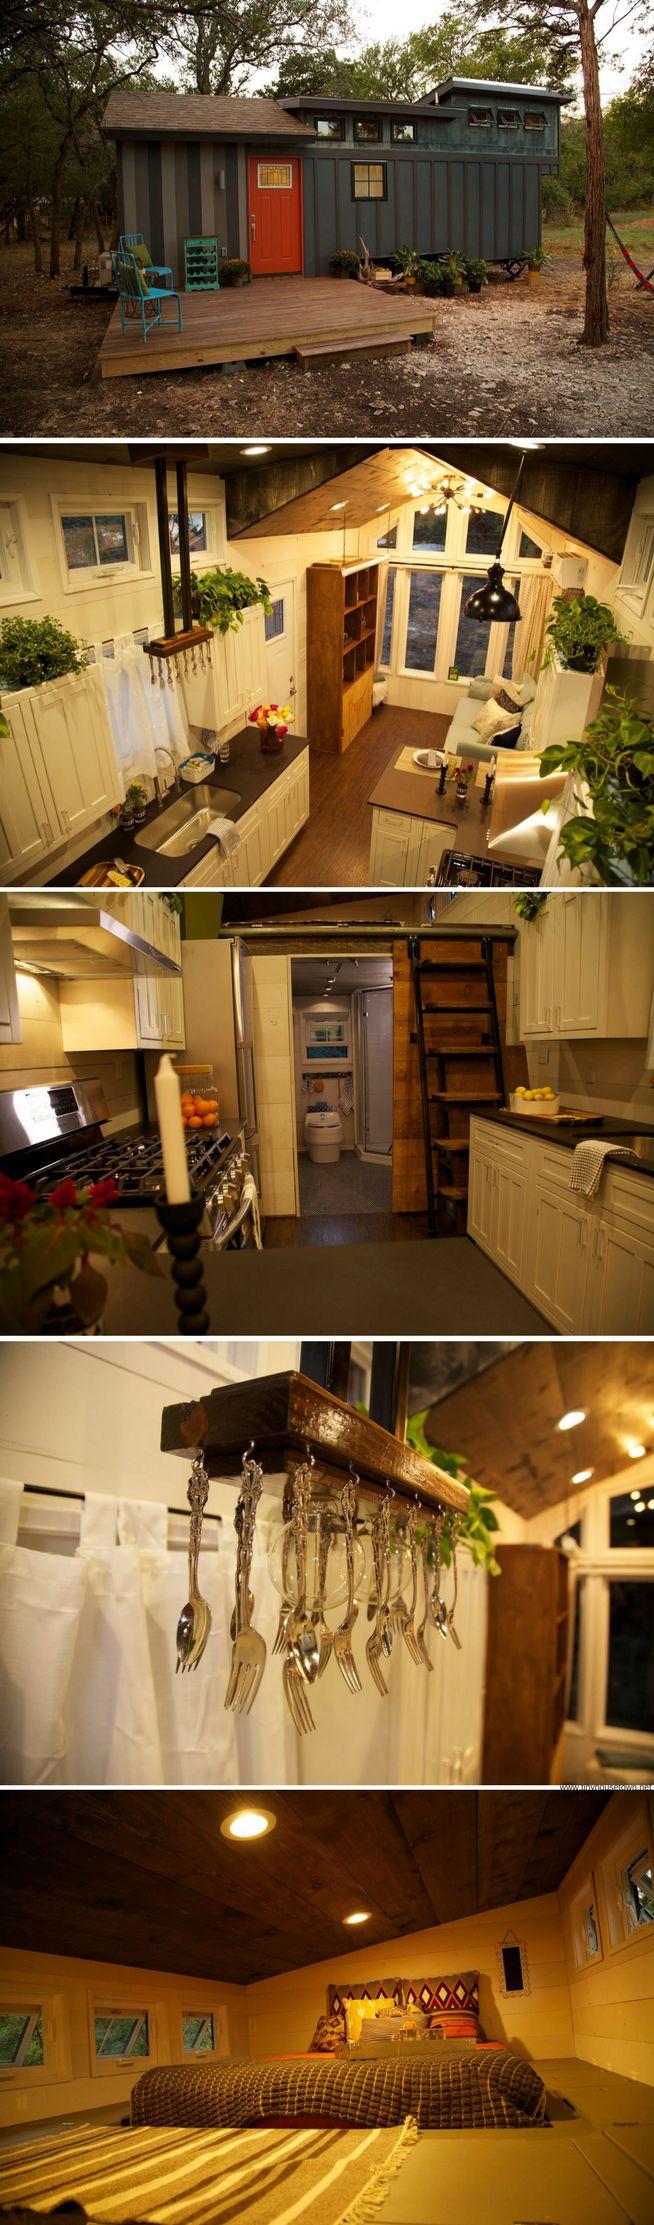 The World Traveler tiny house (250 sq ft)